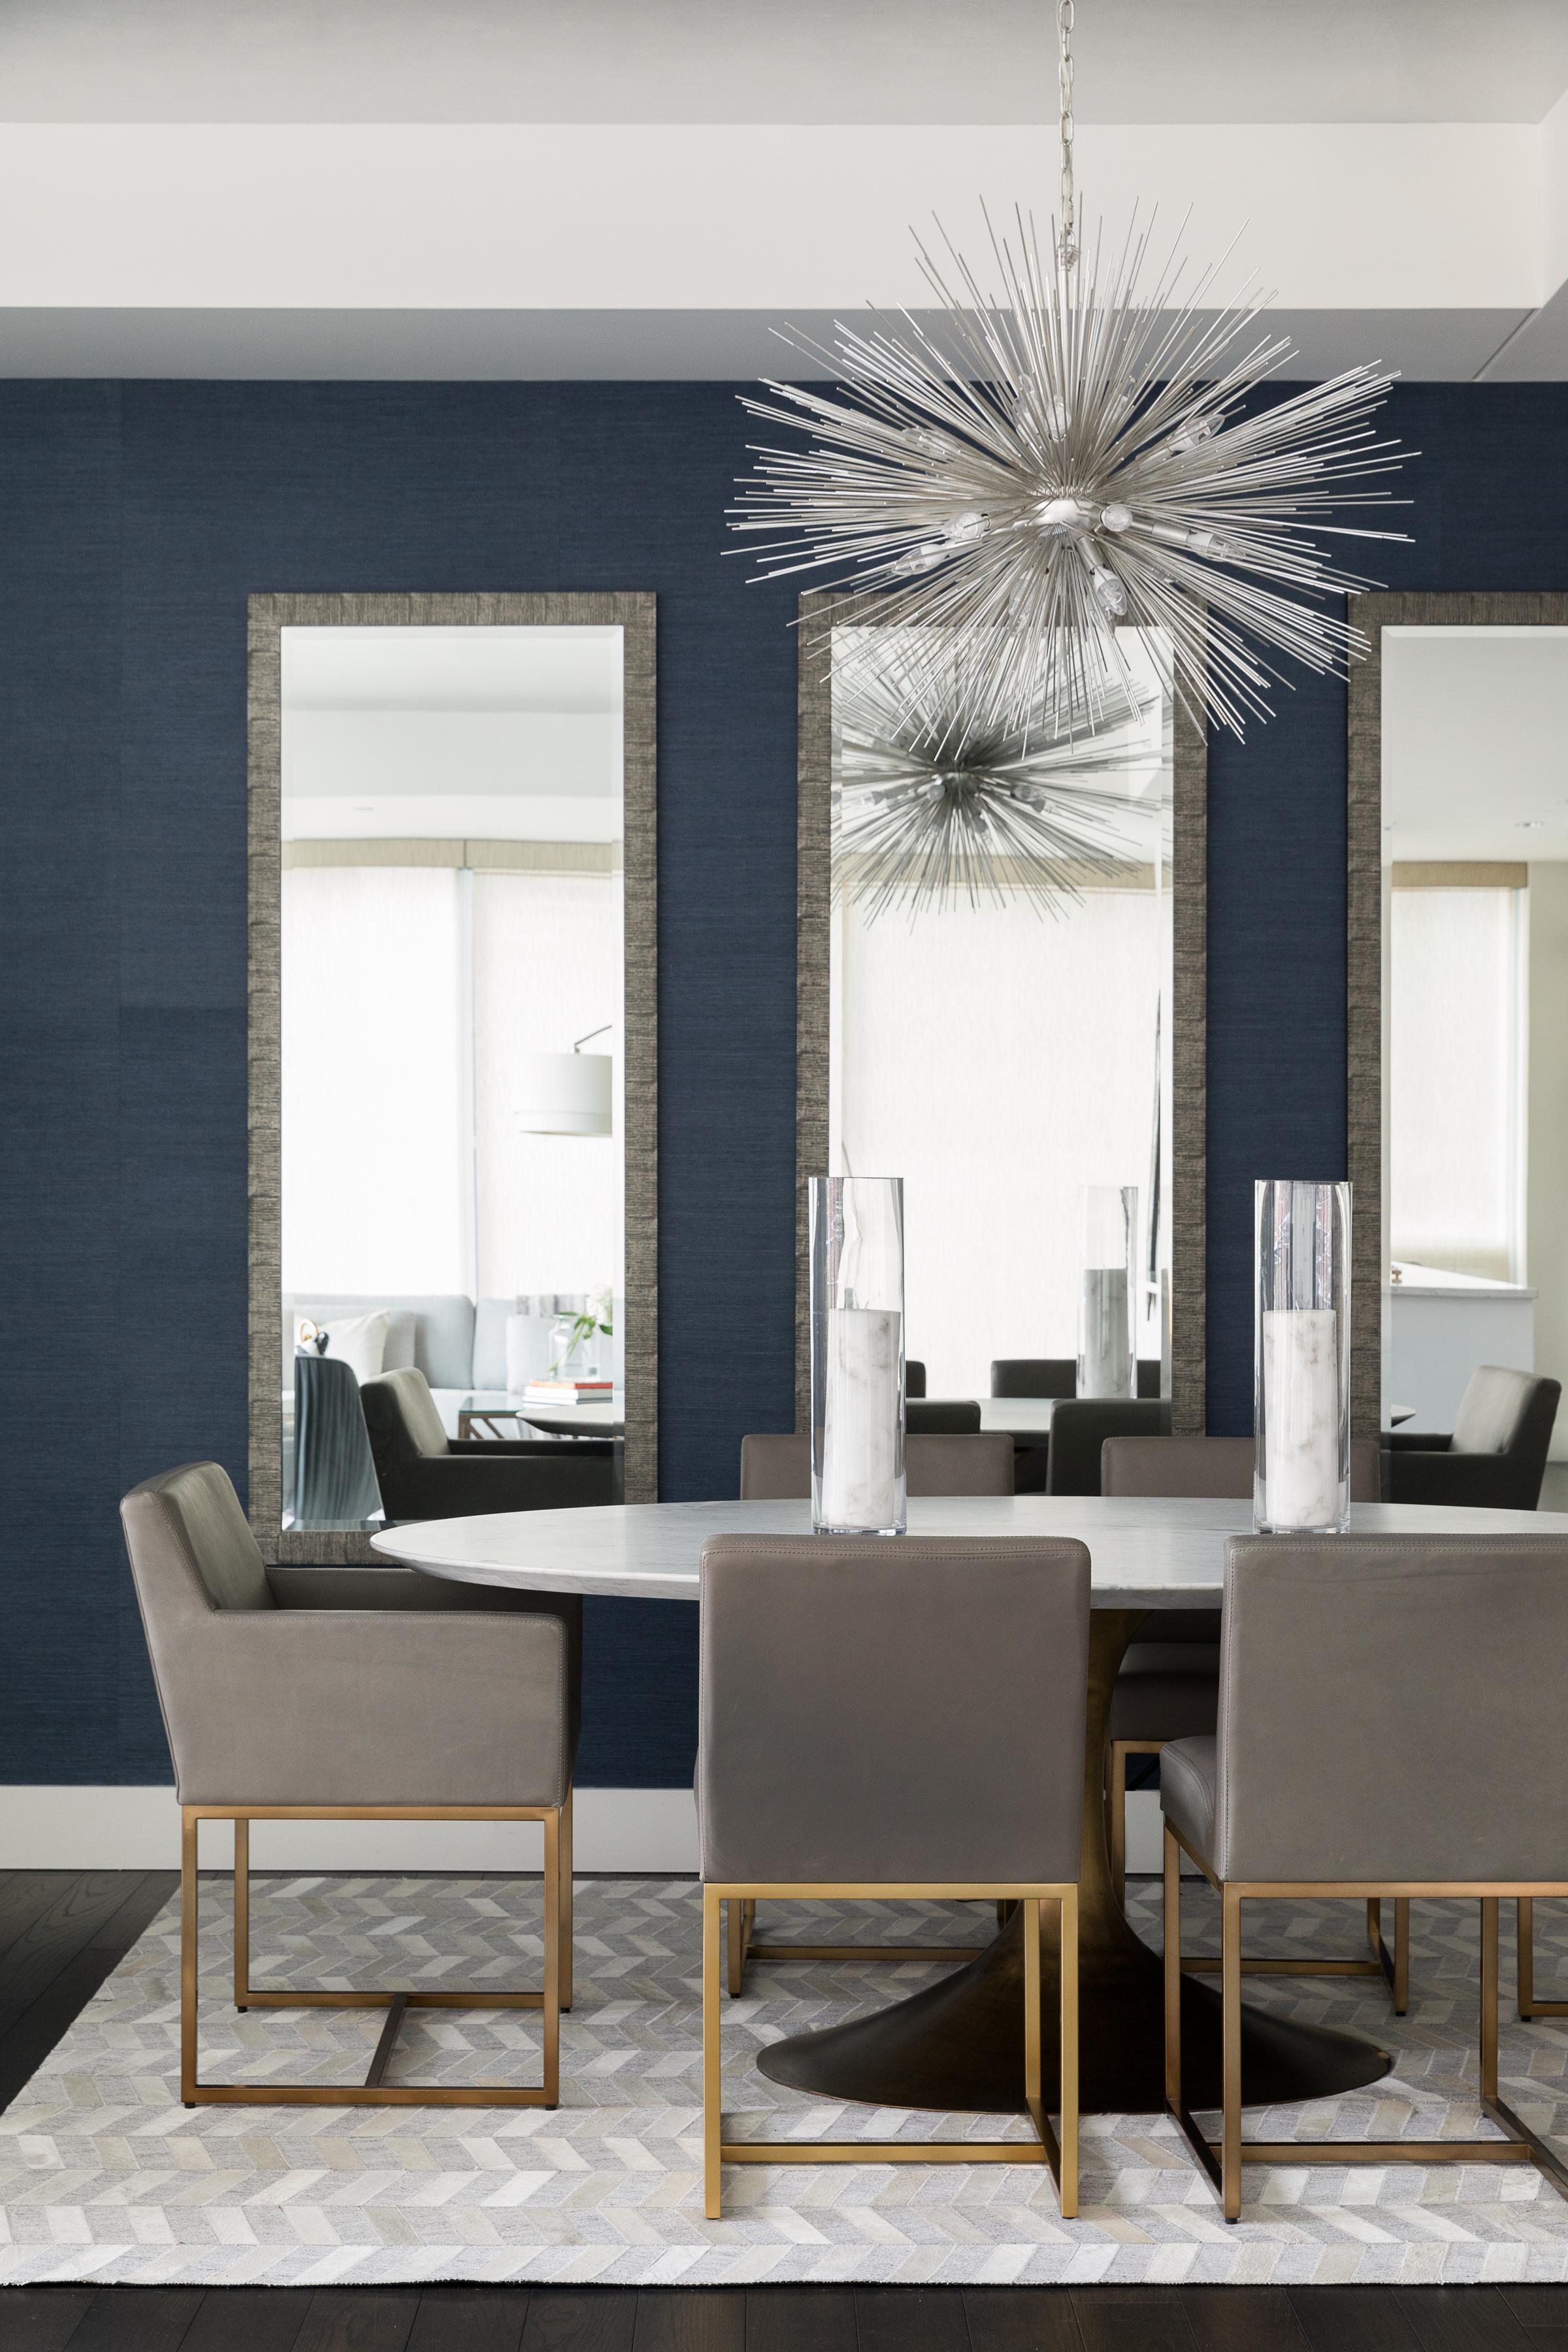 Gina Baran Interiors + Design Interior Designer Boston Massachusetts